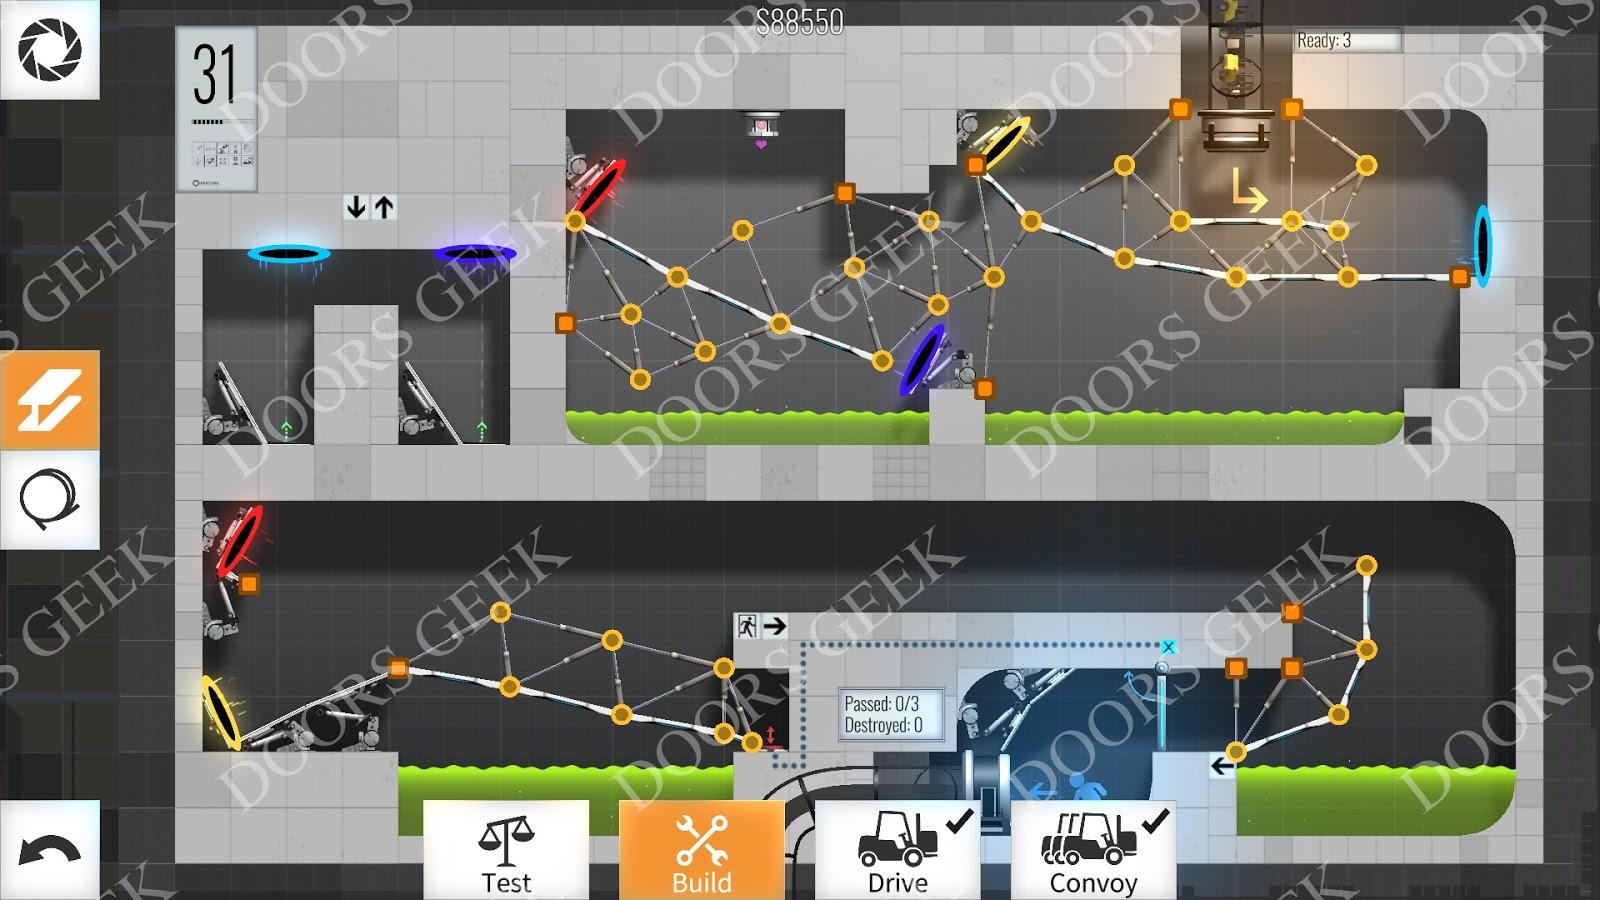 Bridge constructor portal level 31 convoy solution doors for Solution wordbrain cuisine